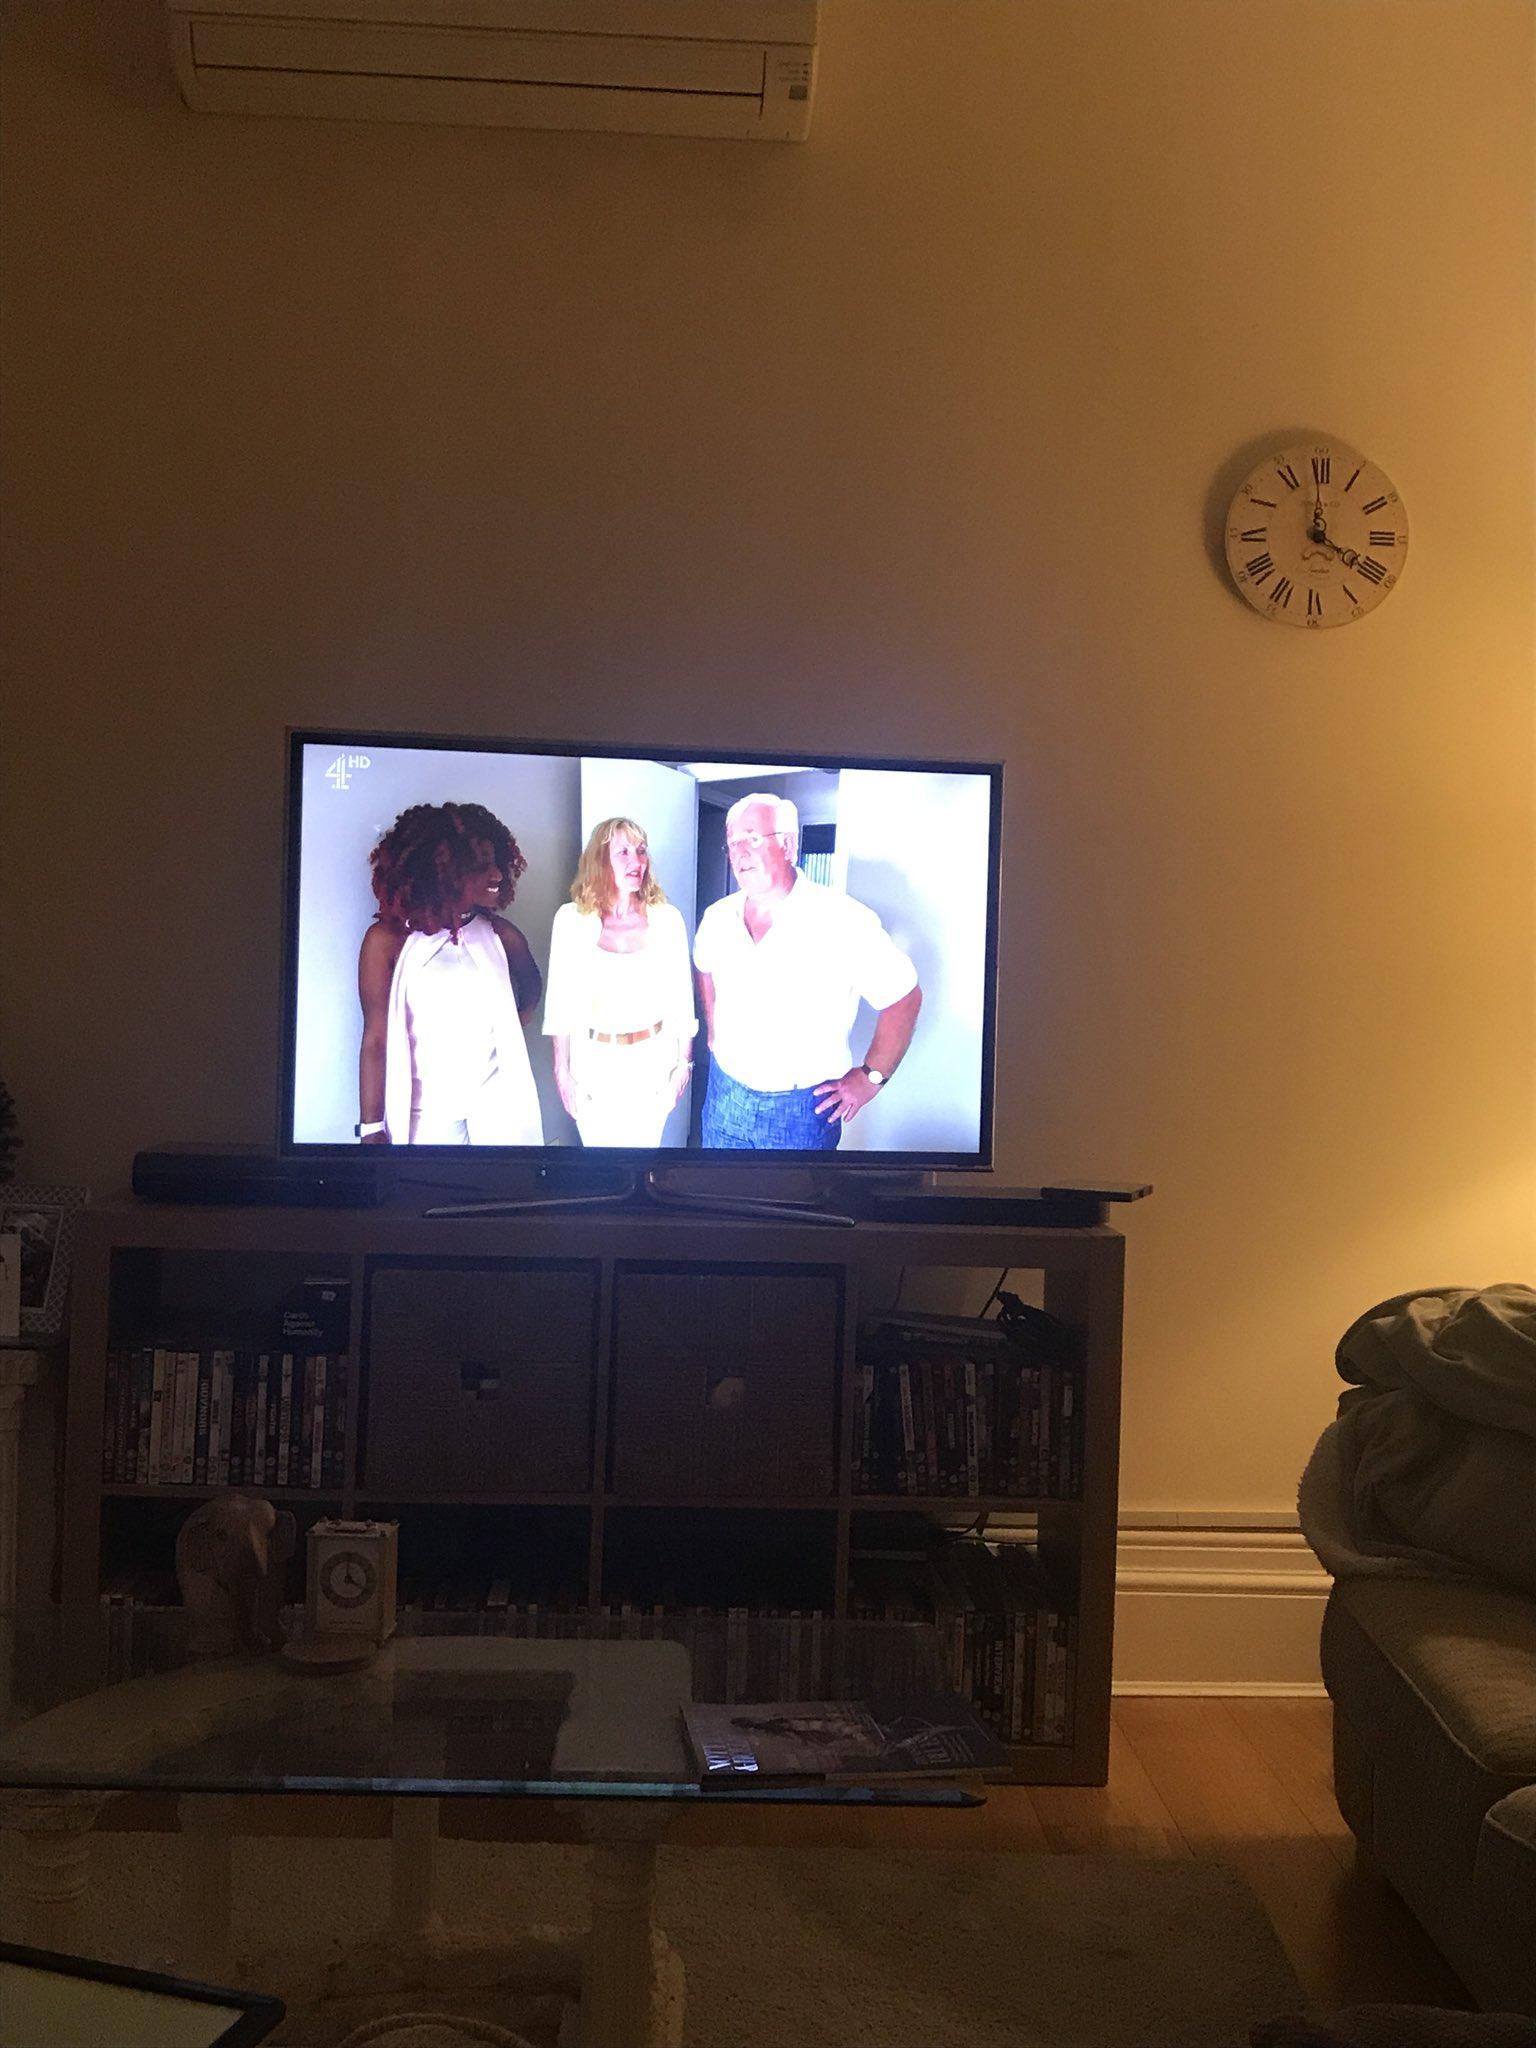 RT @scardoug: I'm on....! Channel 4 now! https://t.co/WU0a0q3bwK